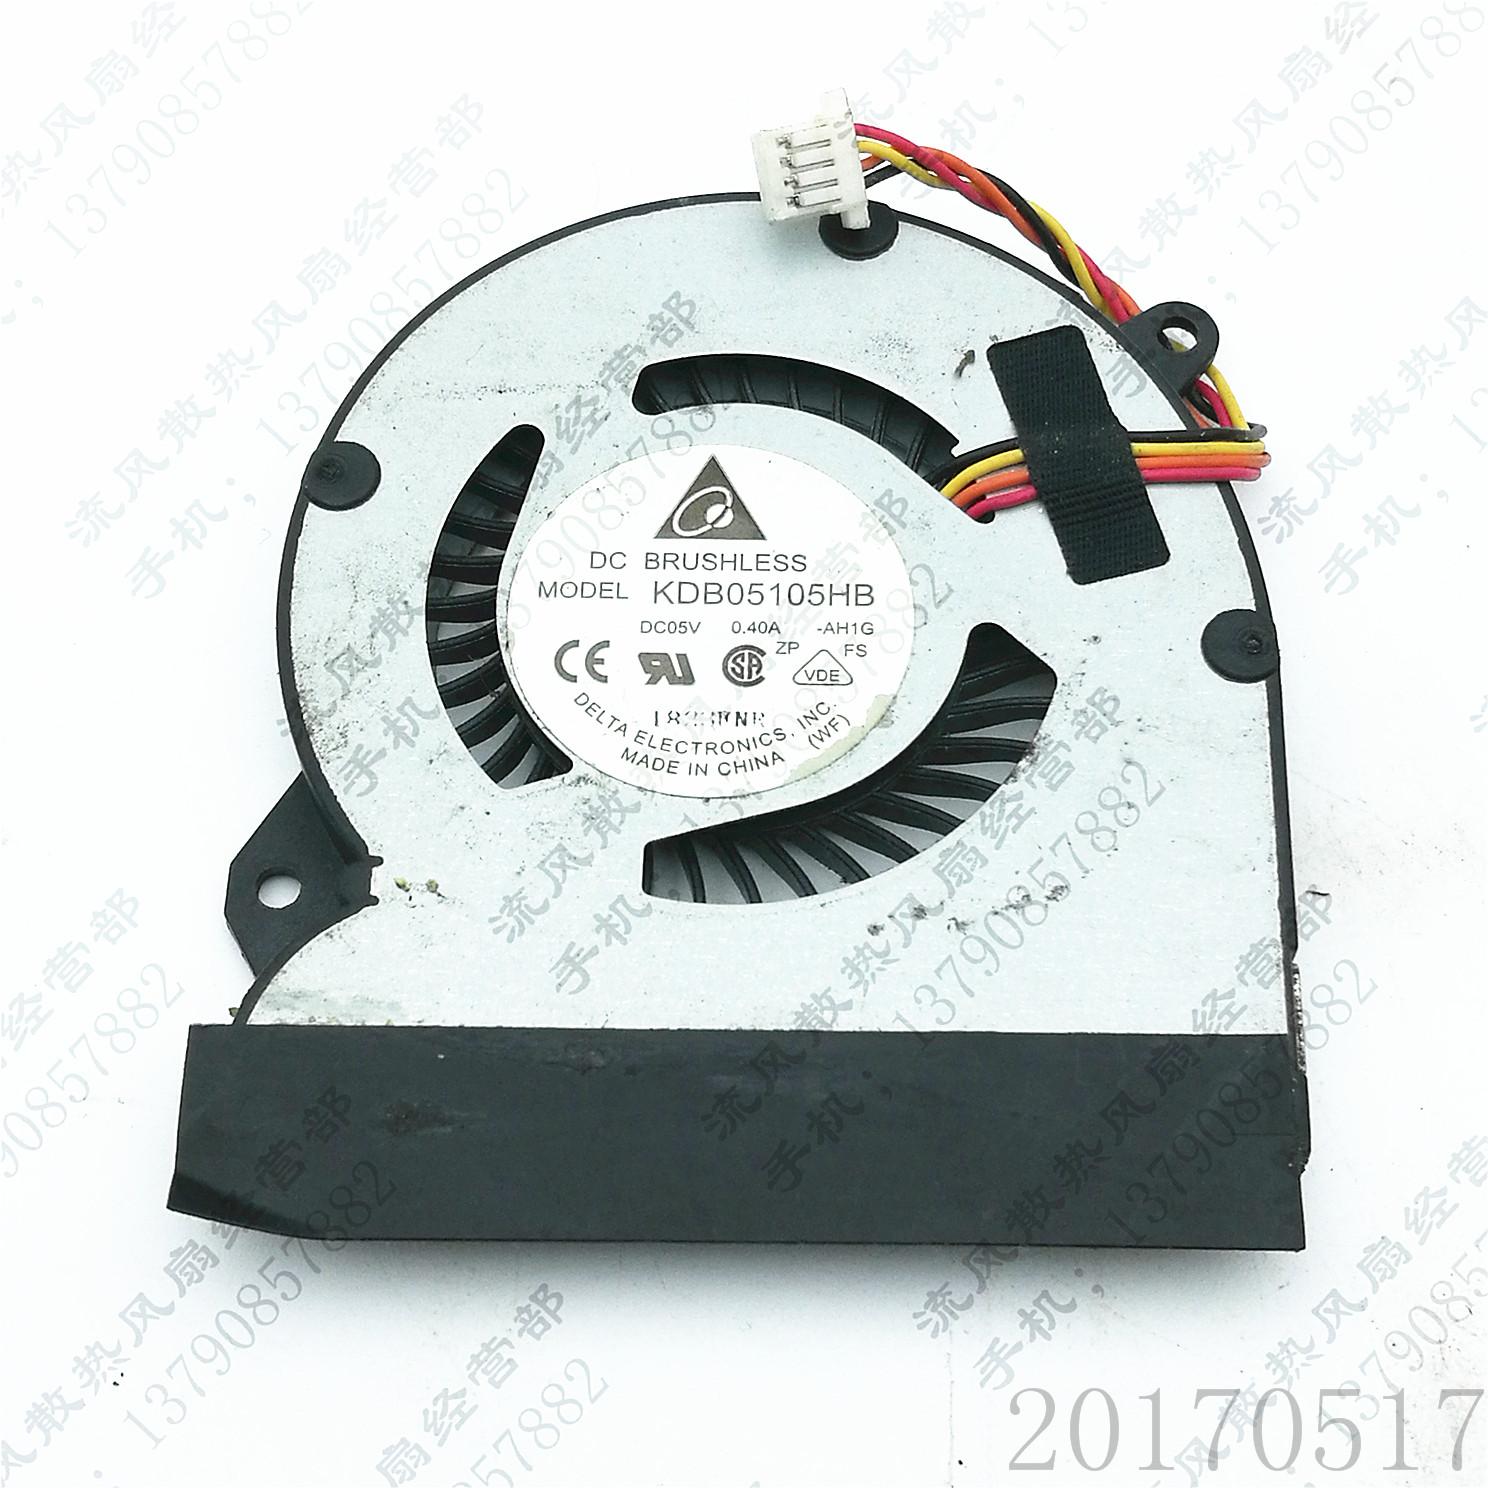 AsusEeePadEP121B121平板电脑散热风扇KDB05105HB-AH1G5V